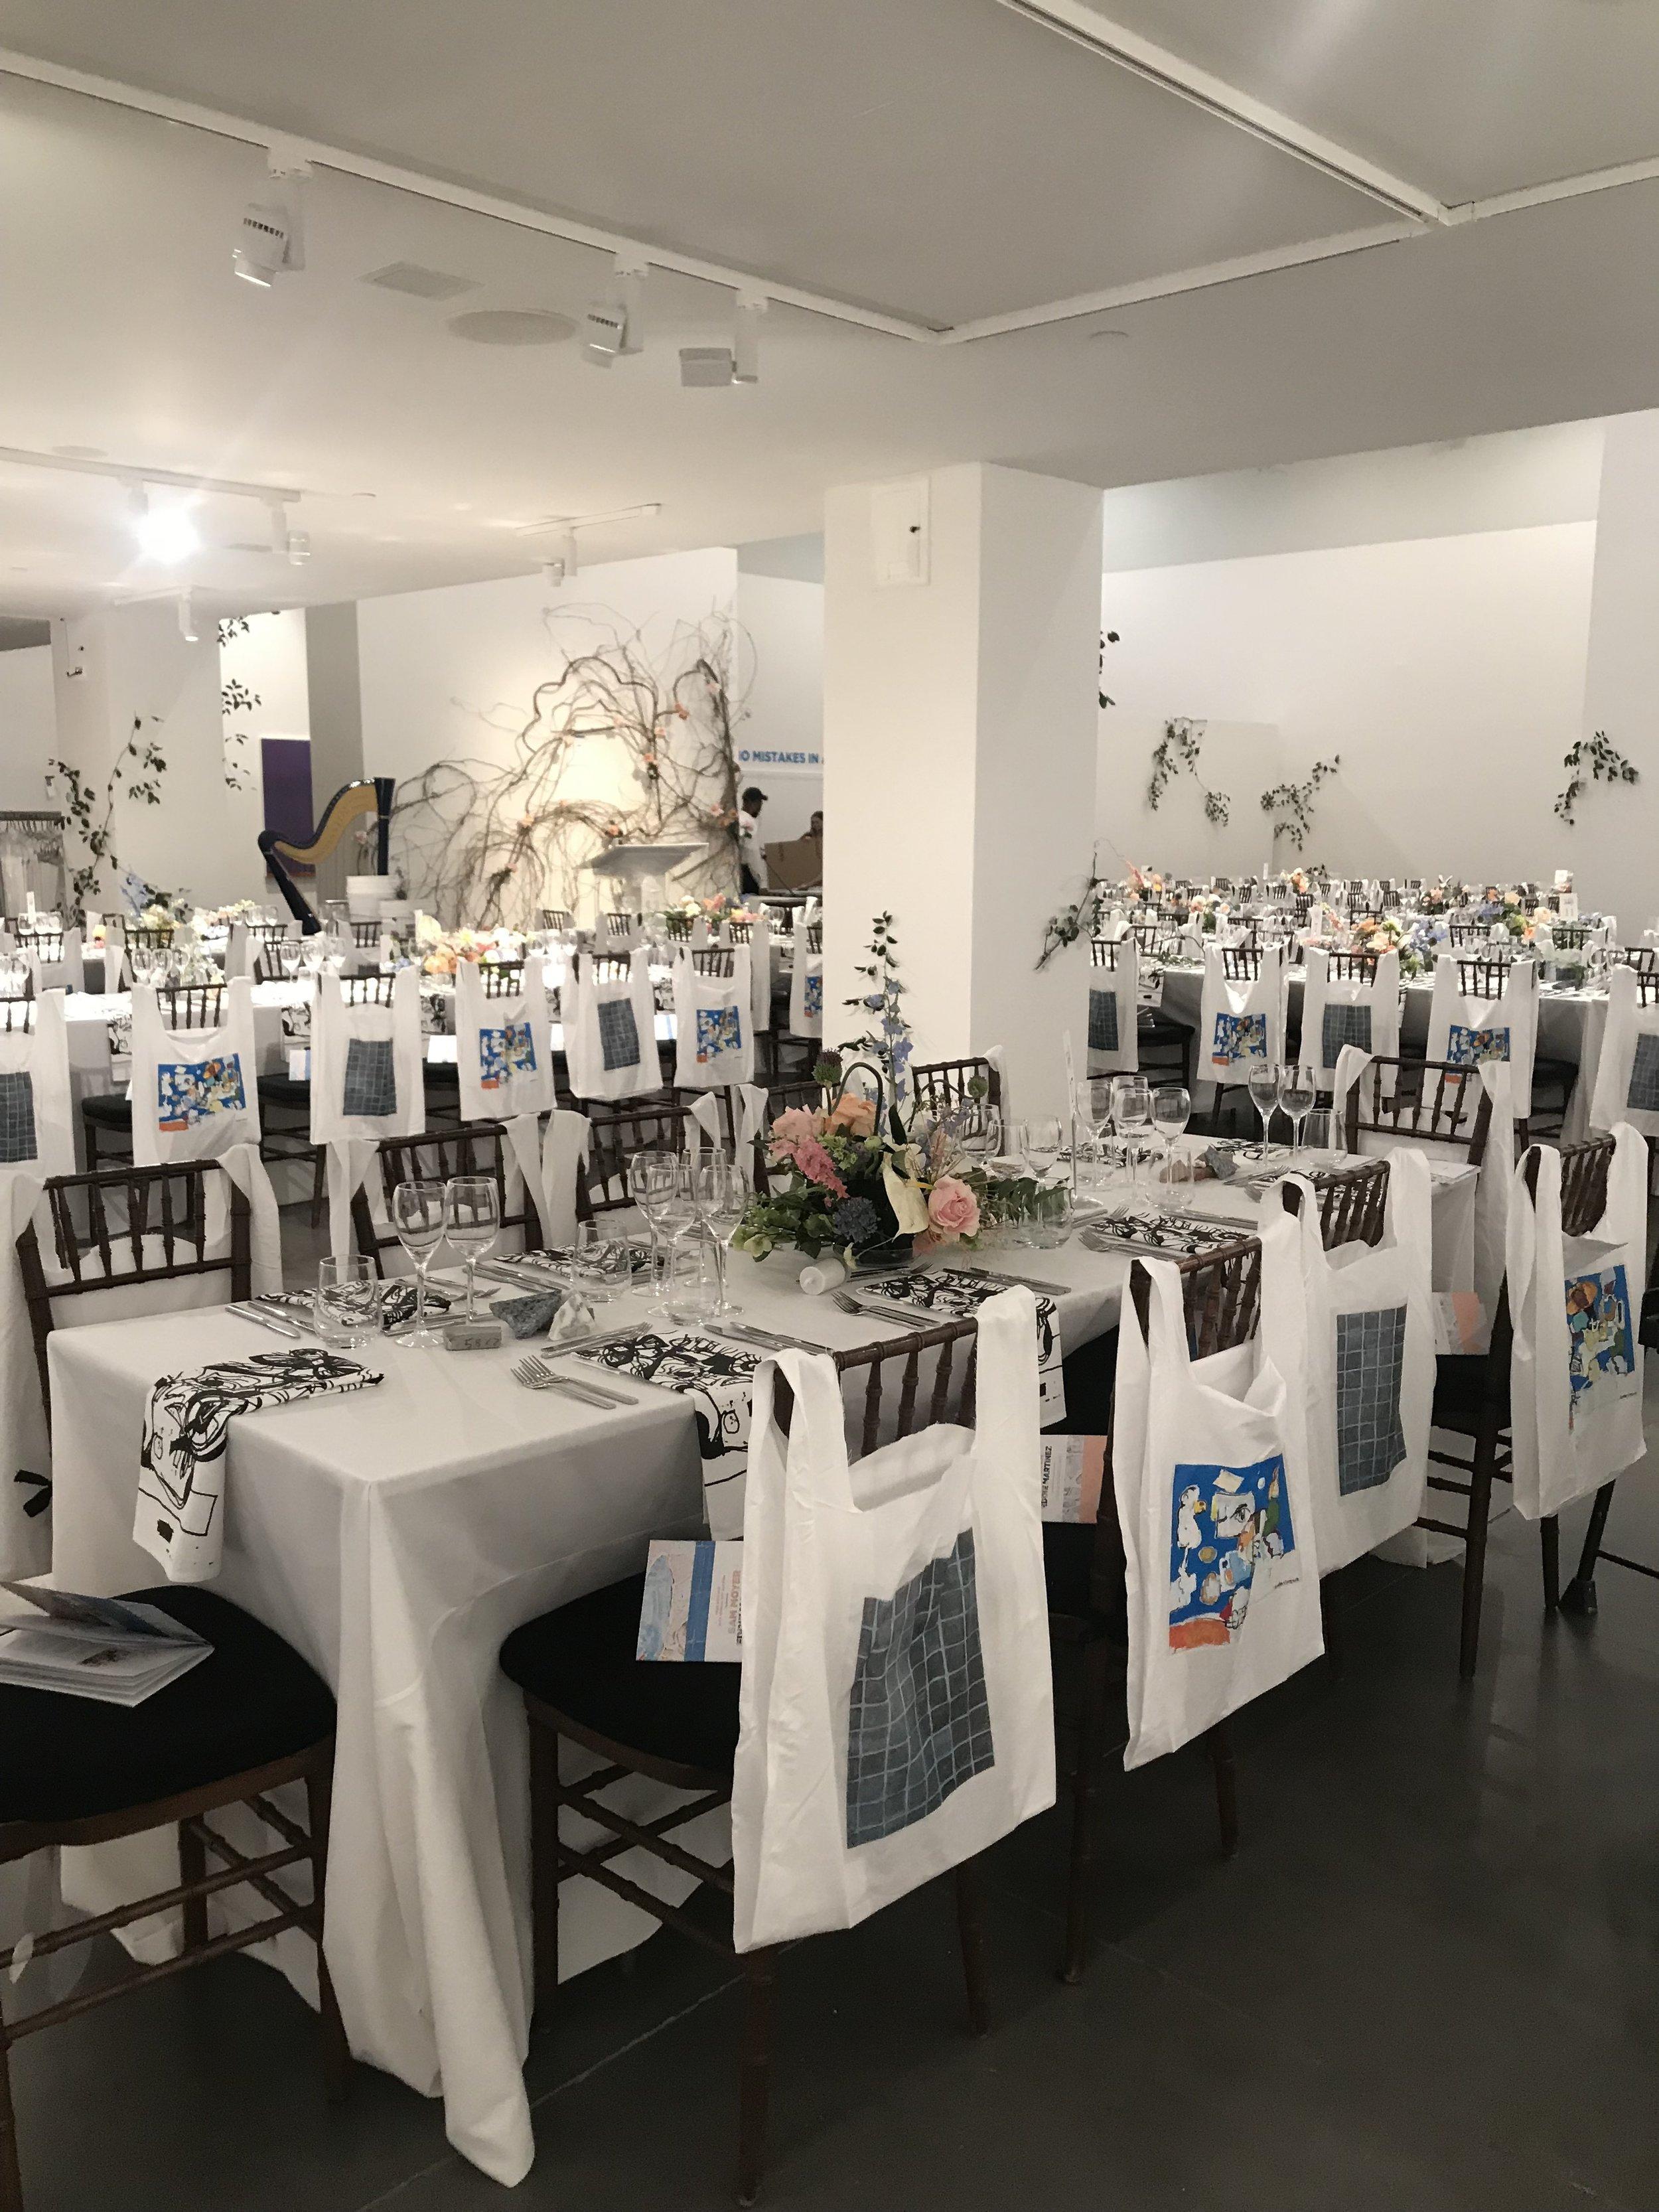 FREE ARTS AUCTION GALA 2019, PHILLIPS NYC